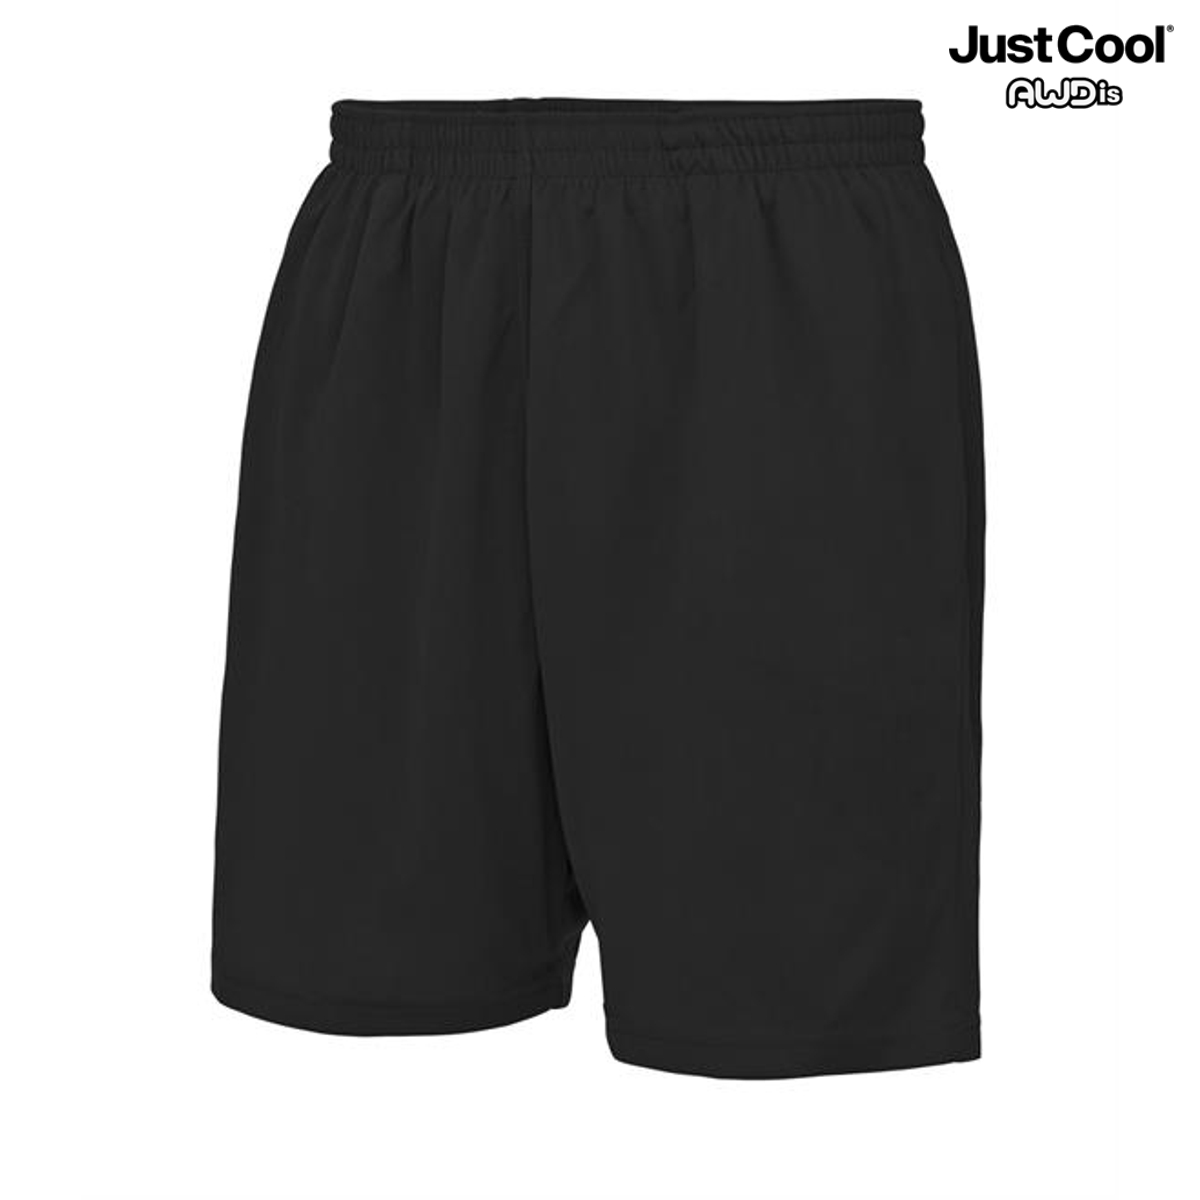 AWDis Childrens Just Cool Shorts